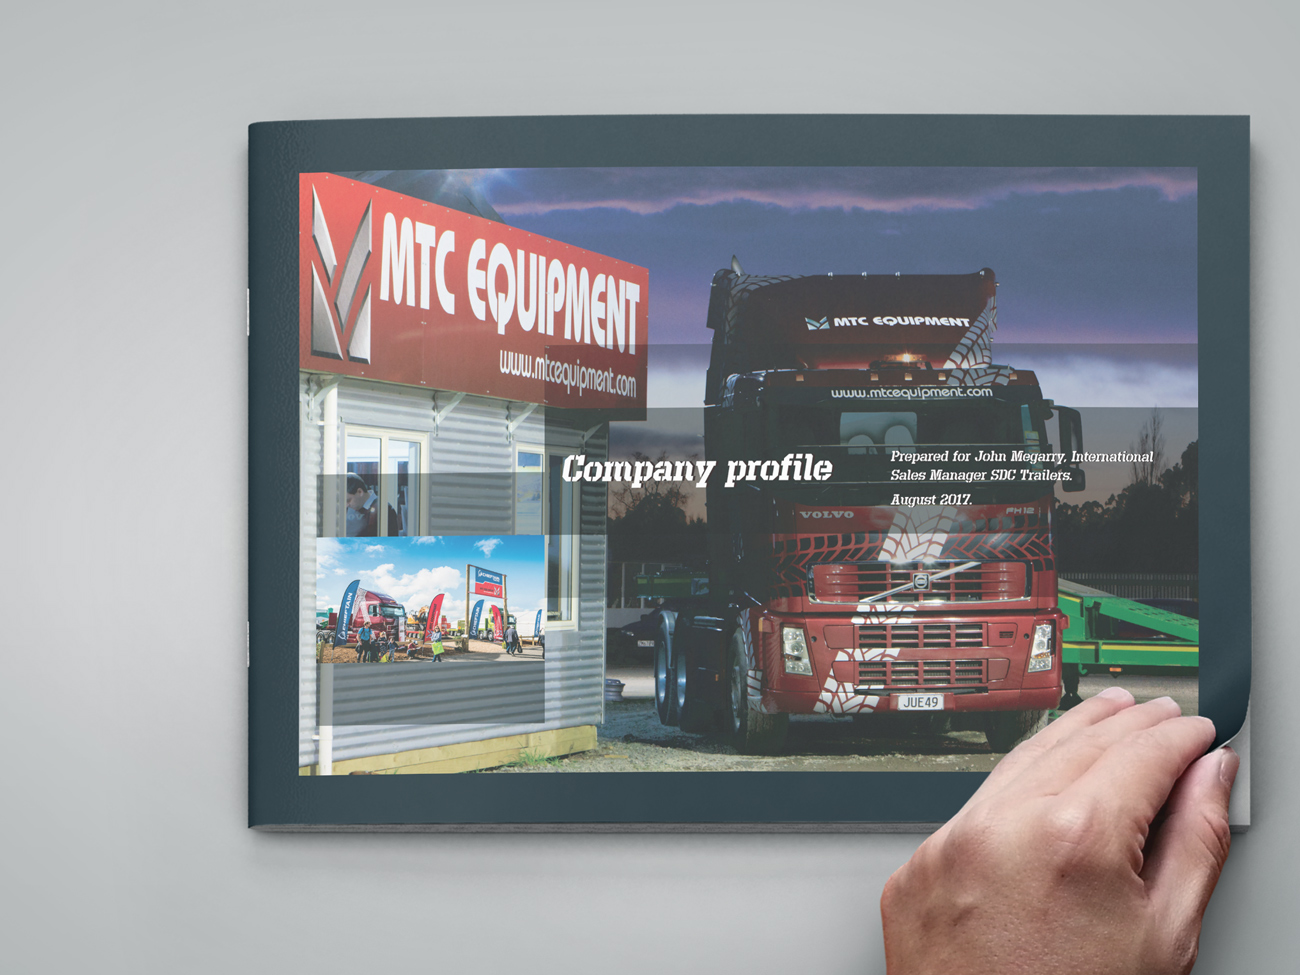 MTC Equipment company profile document front cover.